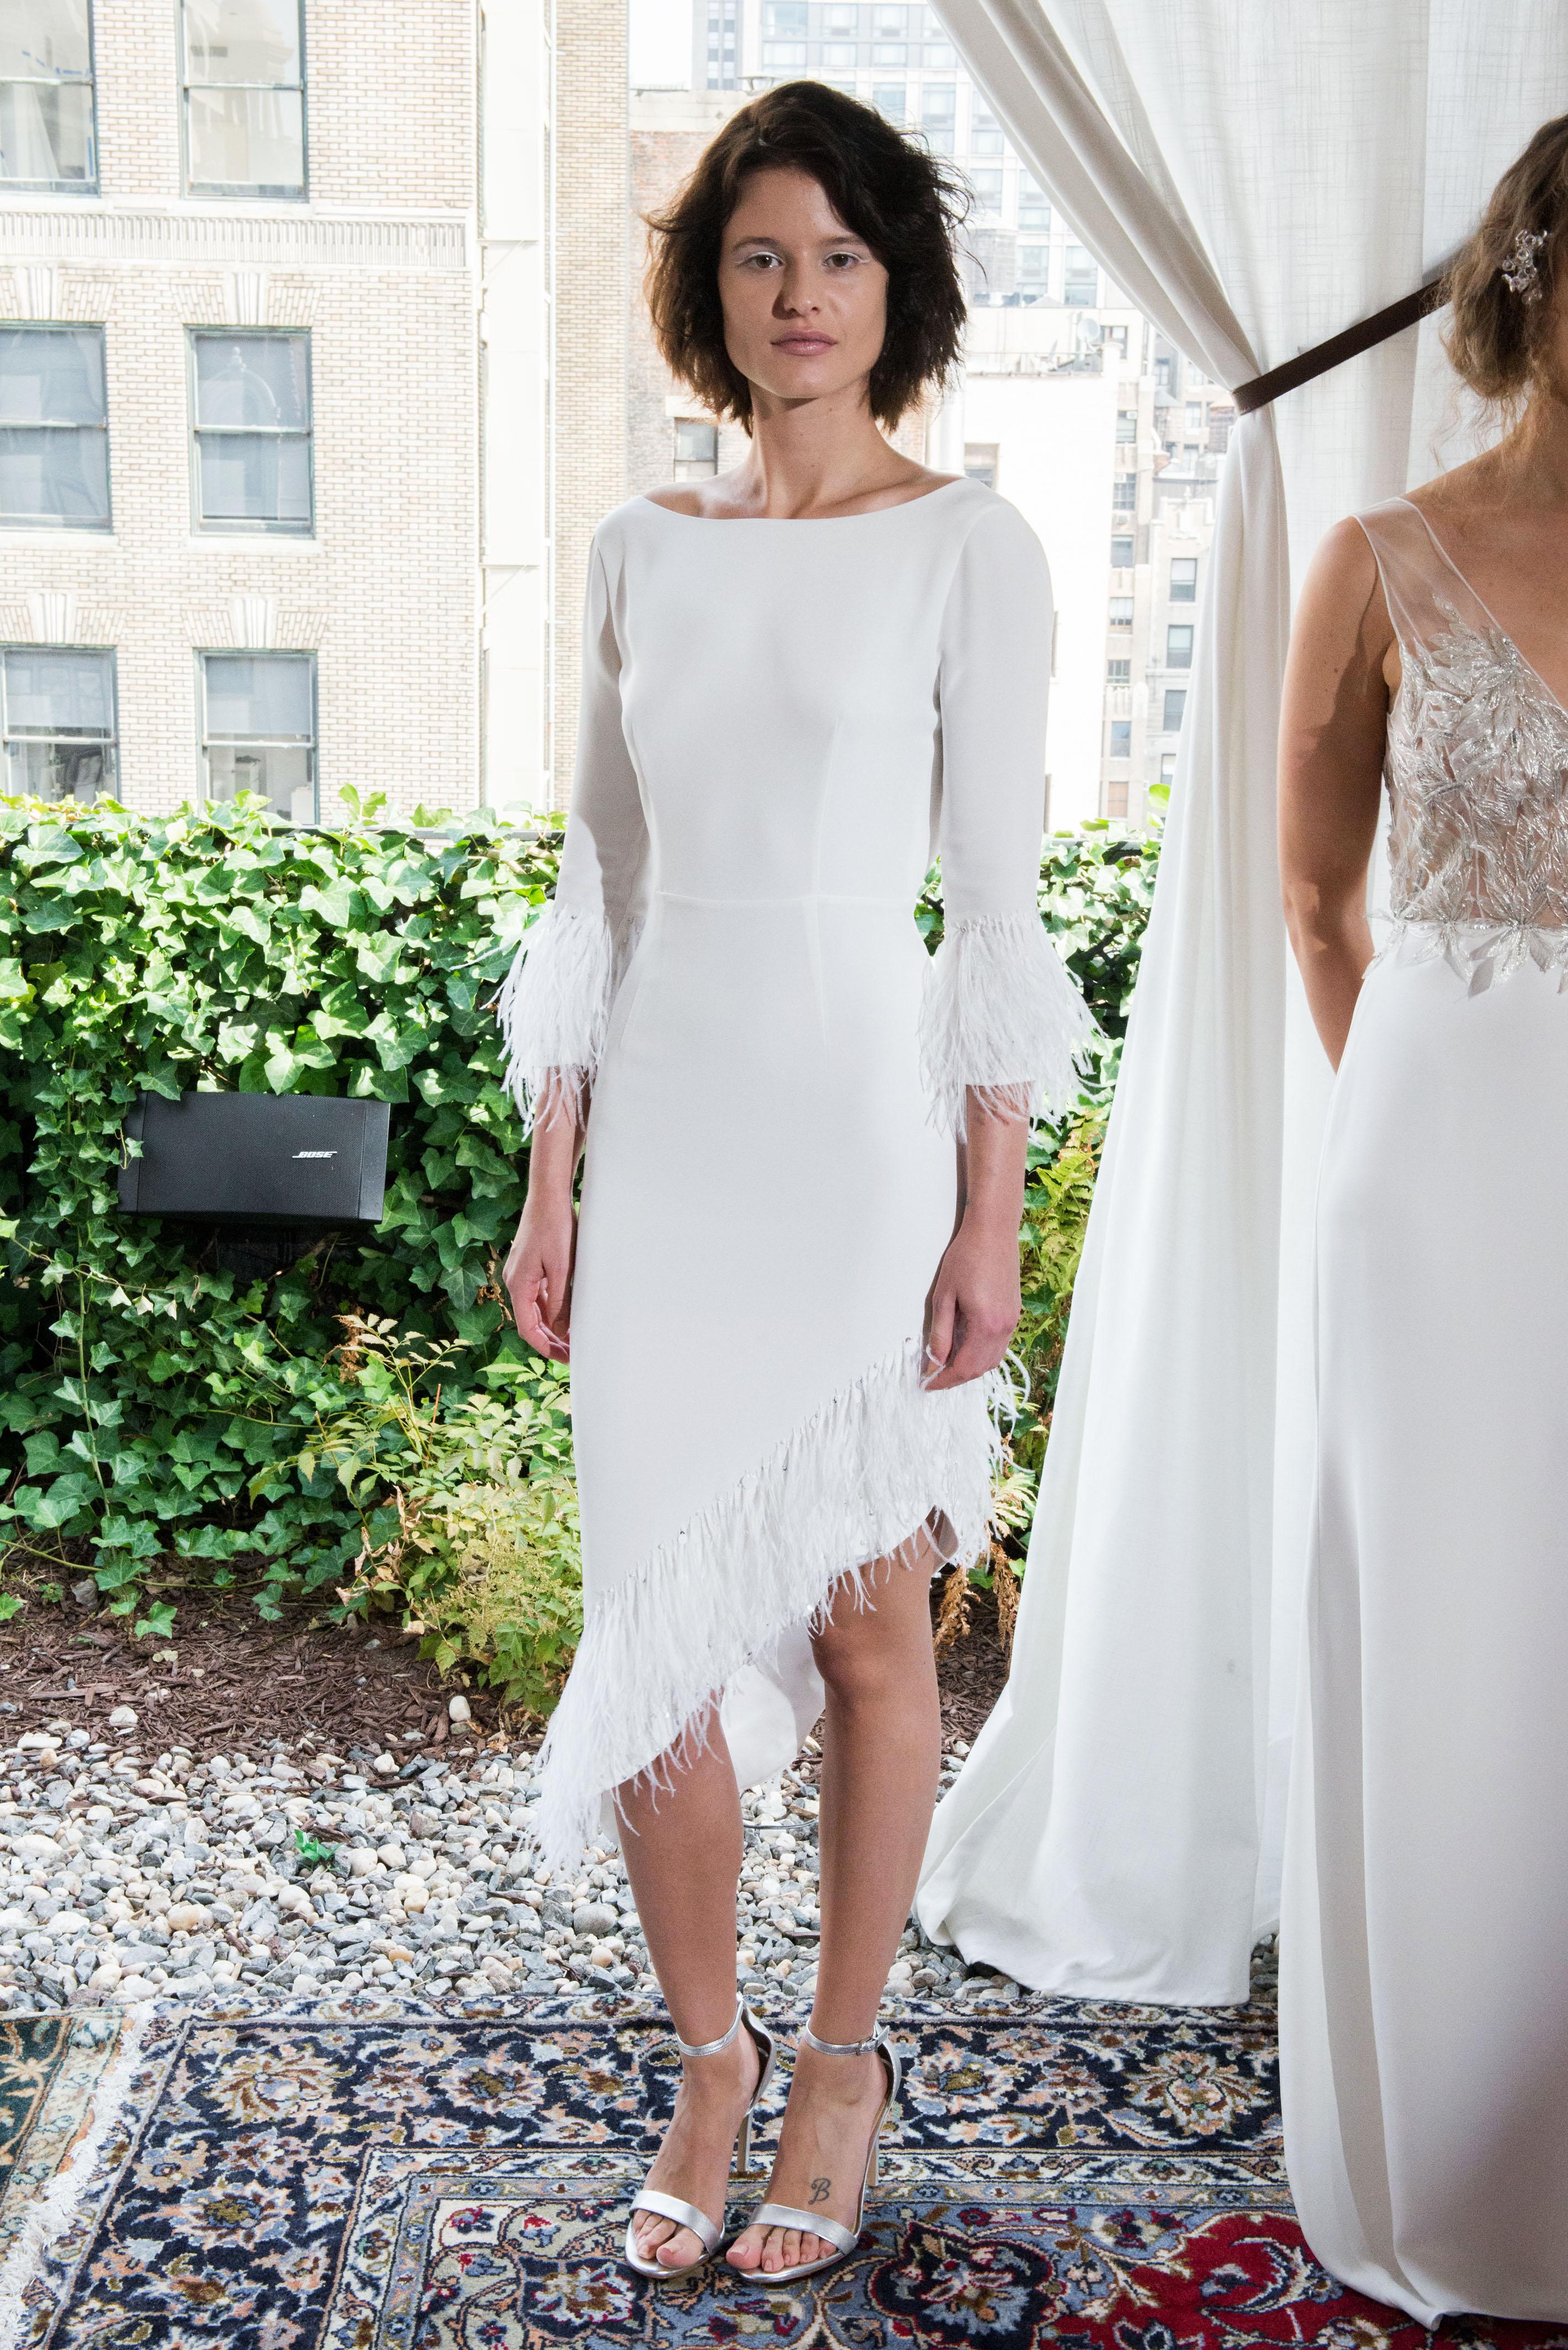 alexandra grecco wedding dress fall 2018 short asymetrical fringe three-quarter length sleeeves